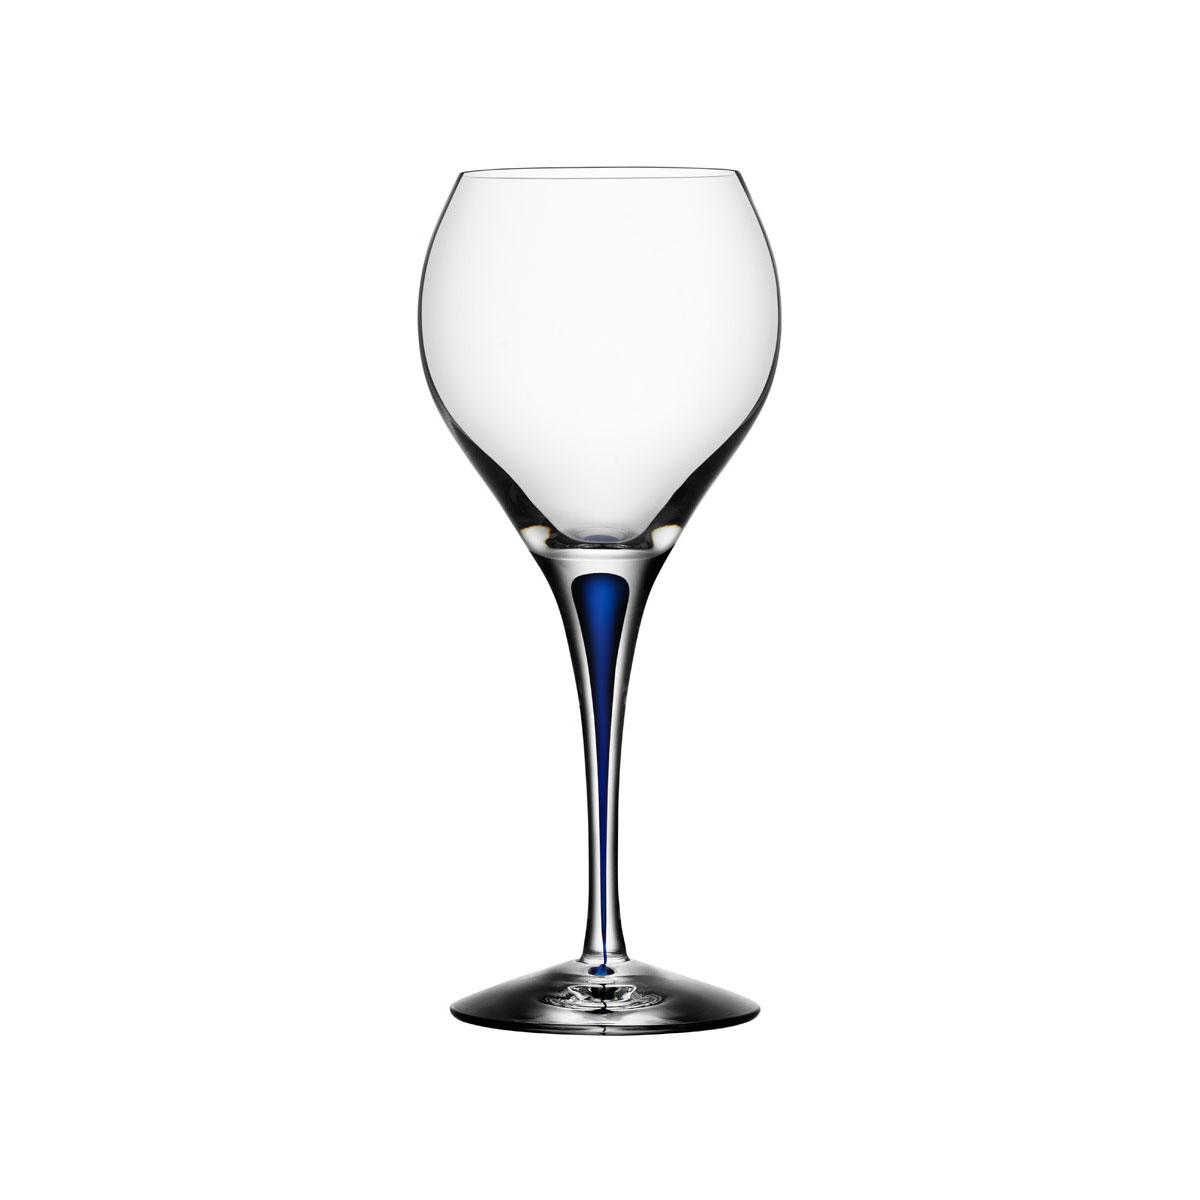 Orrefors Crystal, Intermezzo Blue Sweet Crystal Wine Glass, Single